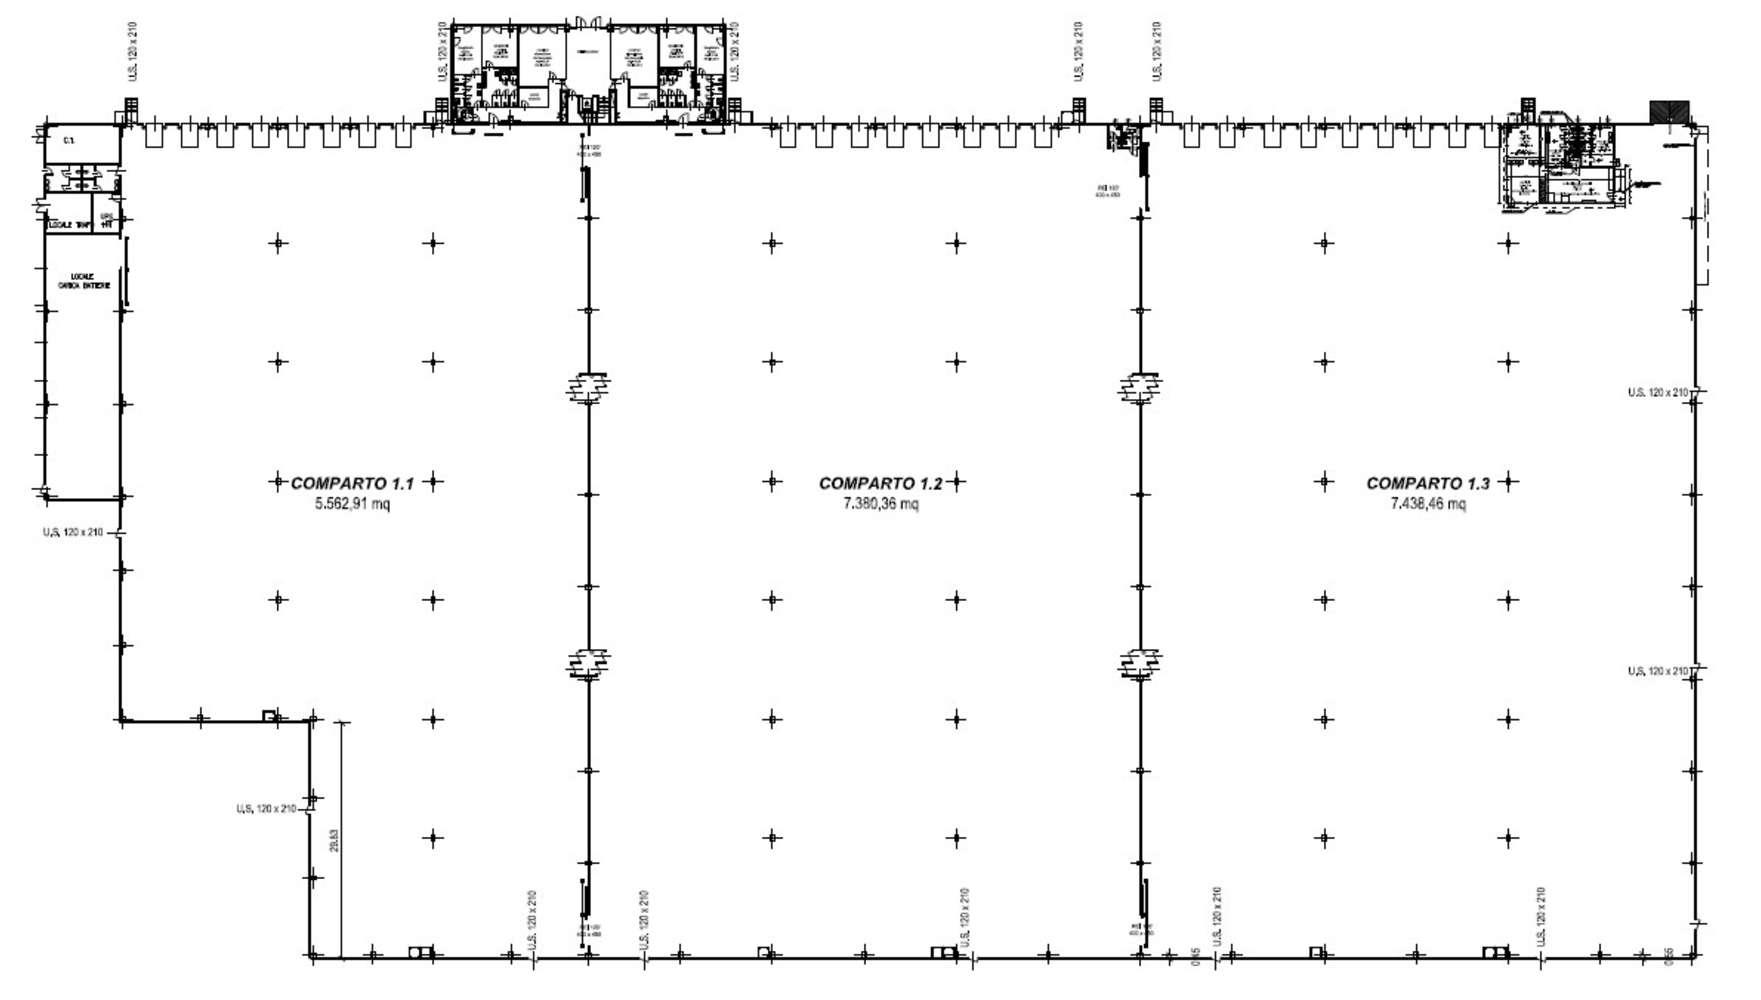 Magazzini industriali e logistici Castel san pietro terme, 40024 - Castel San Pietro Terme (BO) - 9586020